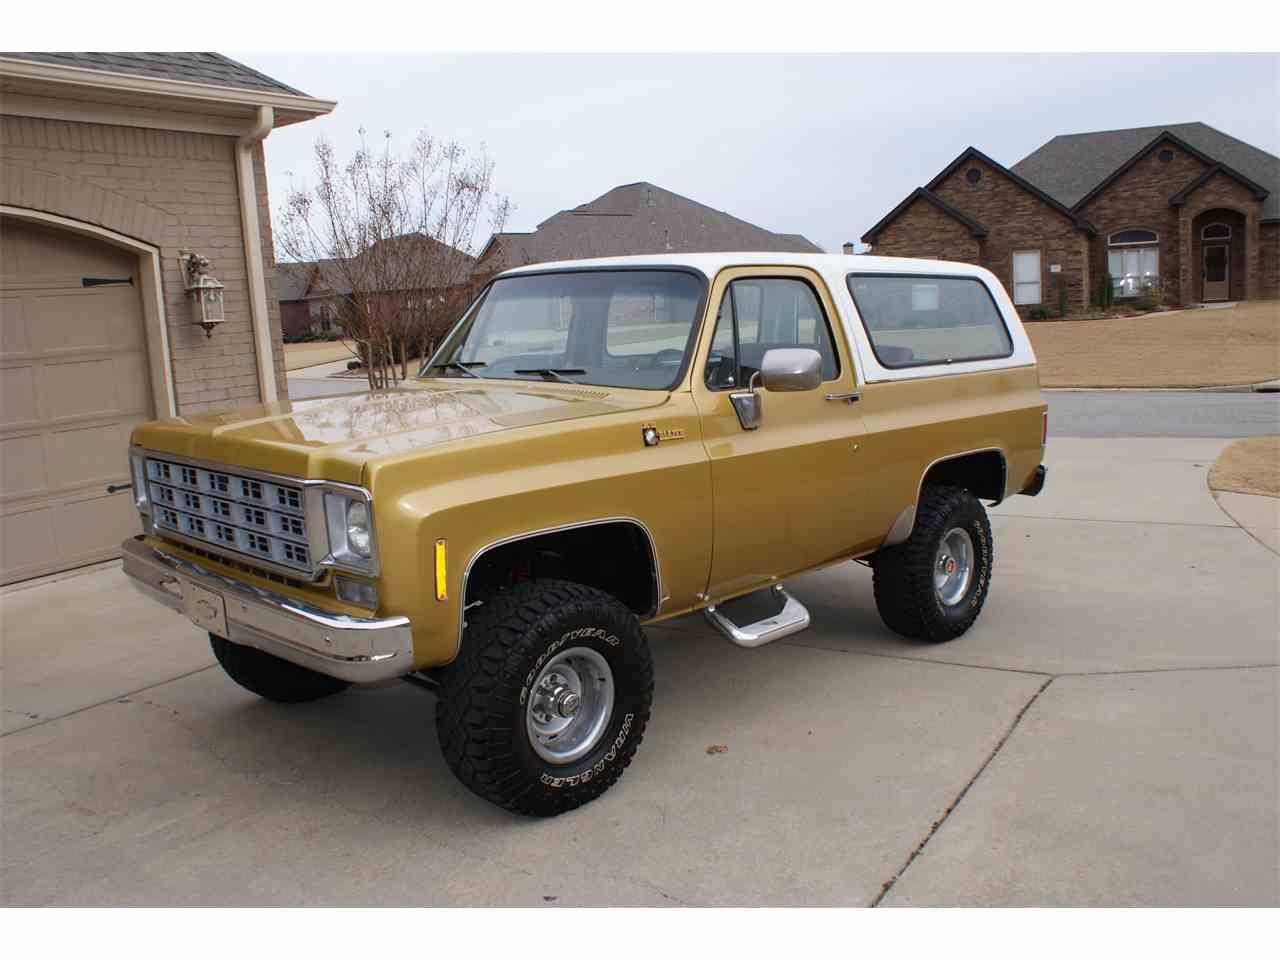 Classic Chevrolet Blazer for Sale on ClassicCars.com - Pg 3